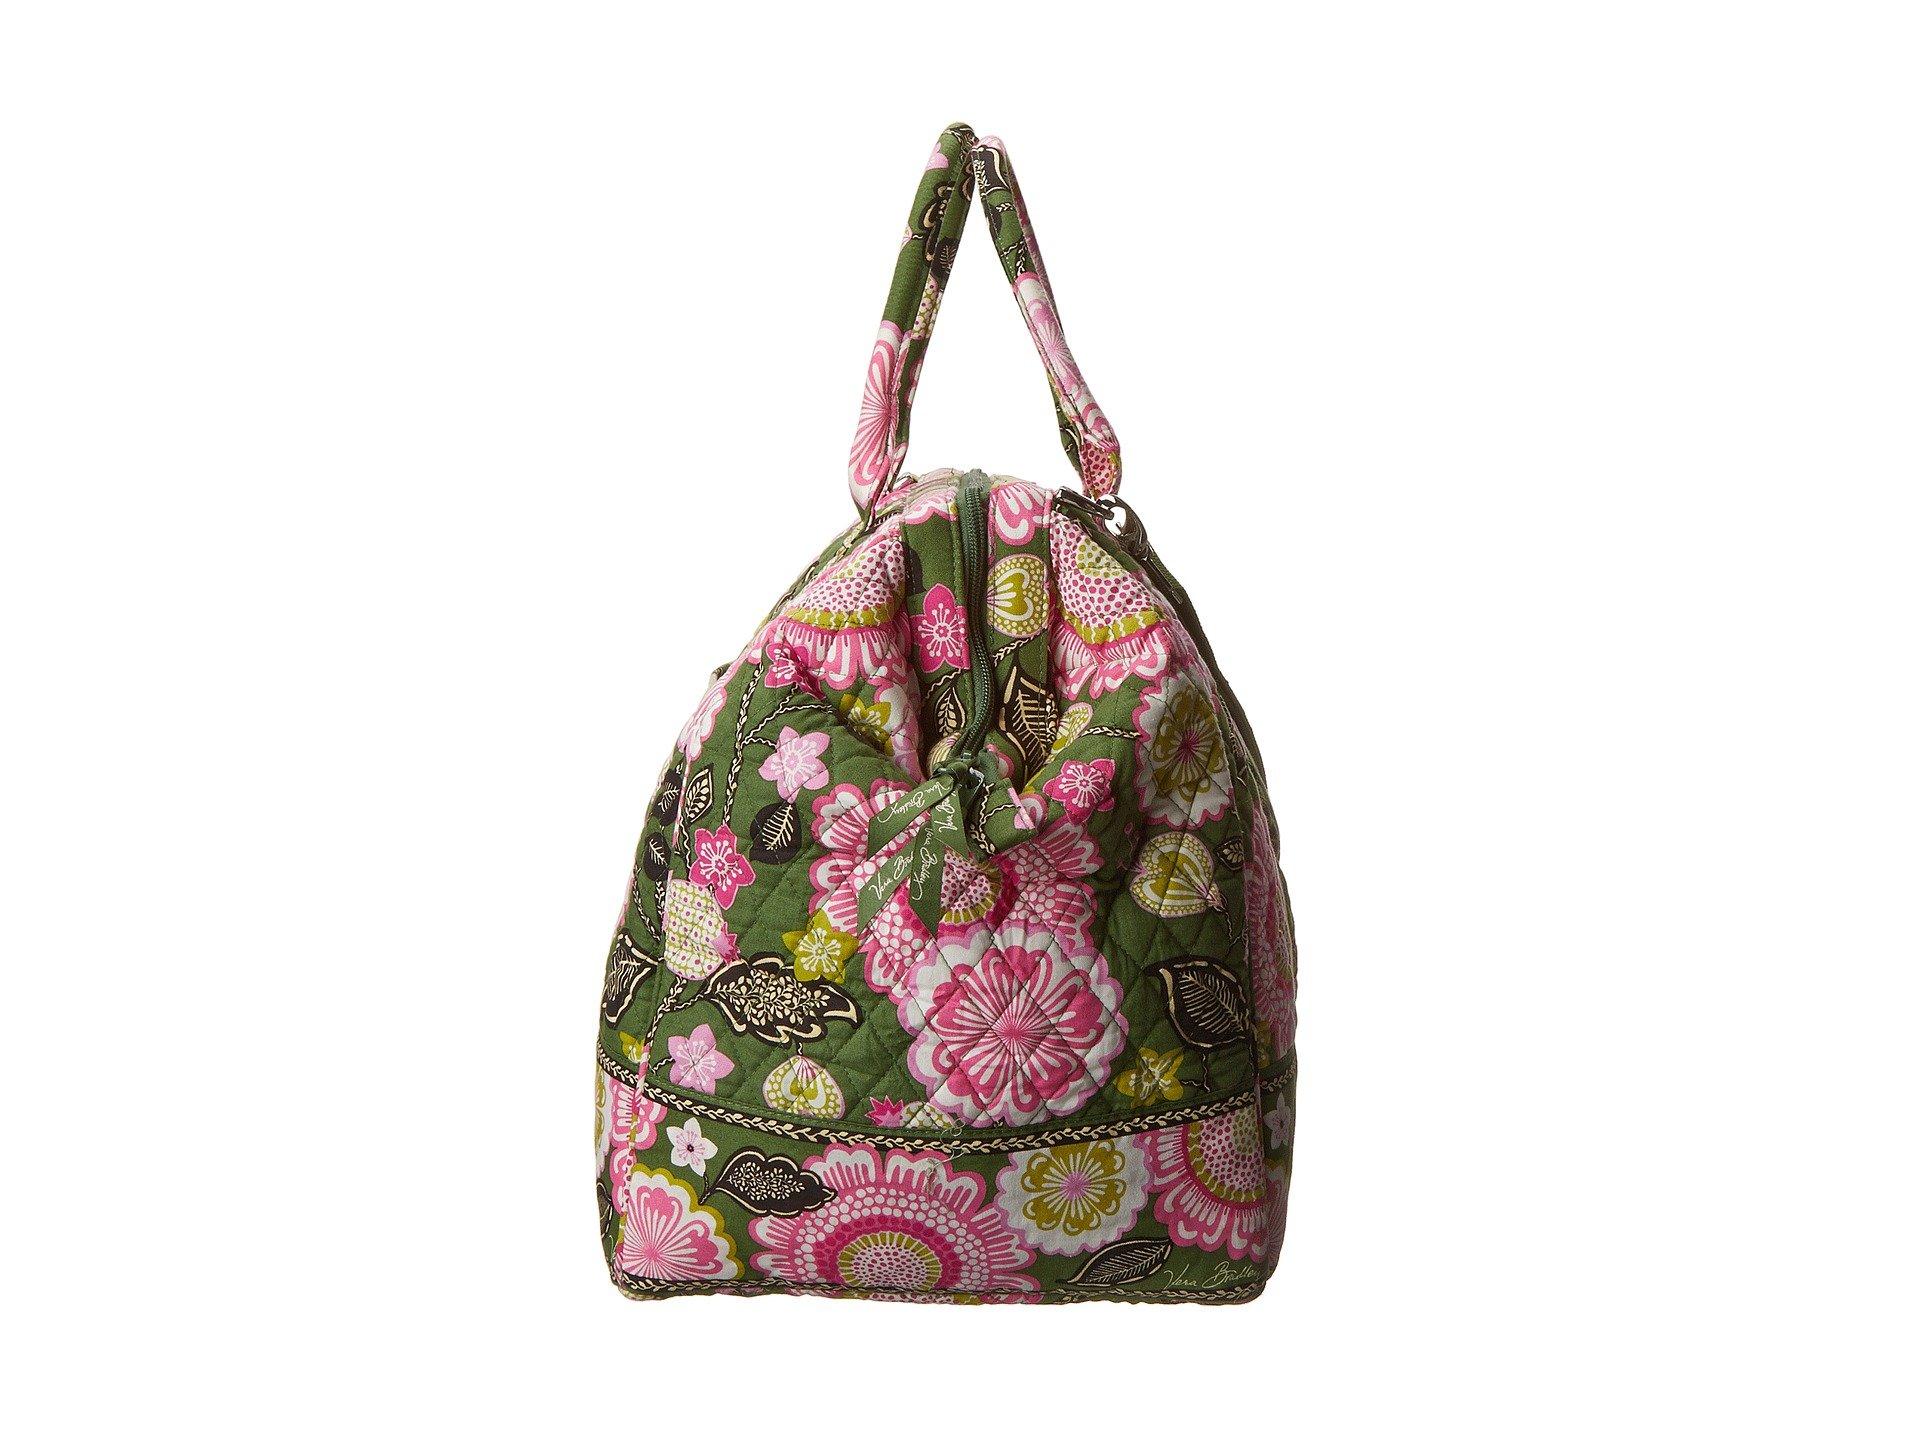 Lyst - Vera Bradley Luggage Frame Travel Bag in Green